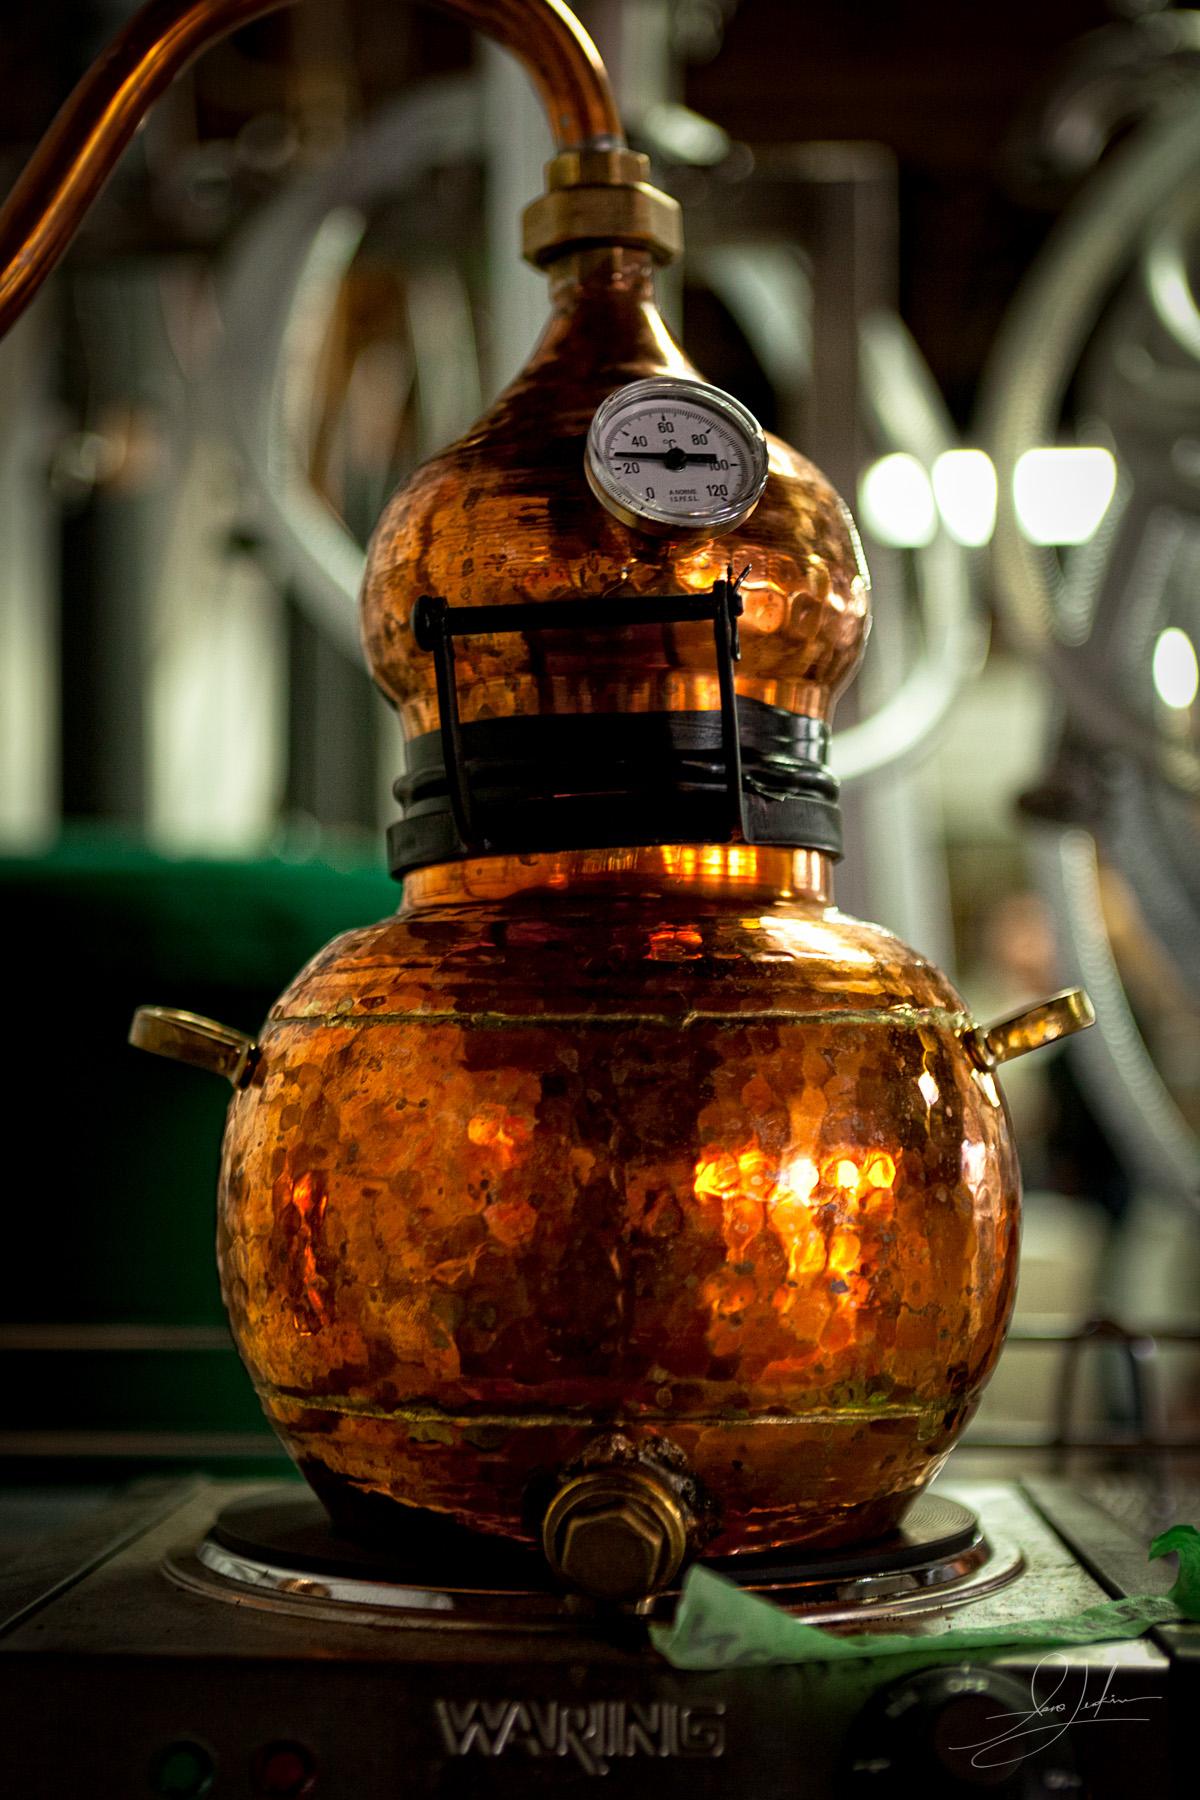 Worldwide Photowalk Distillery Tour Testing